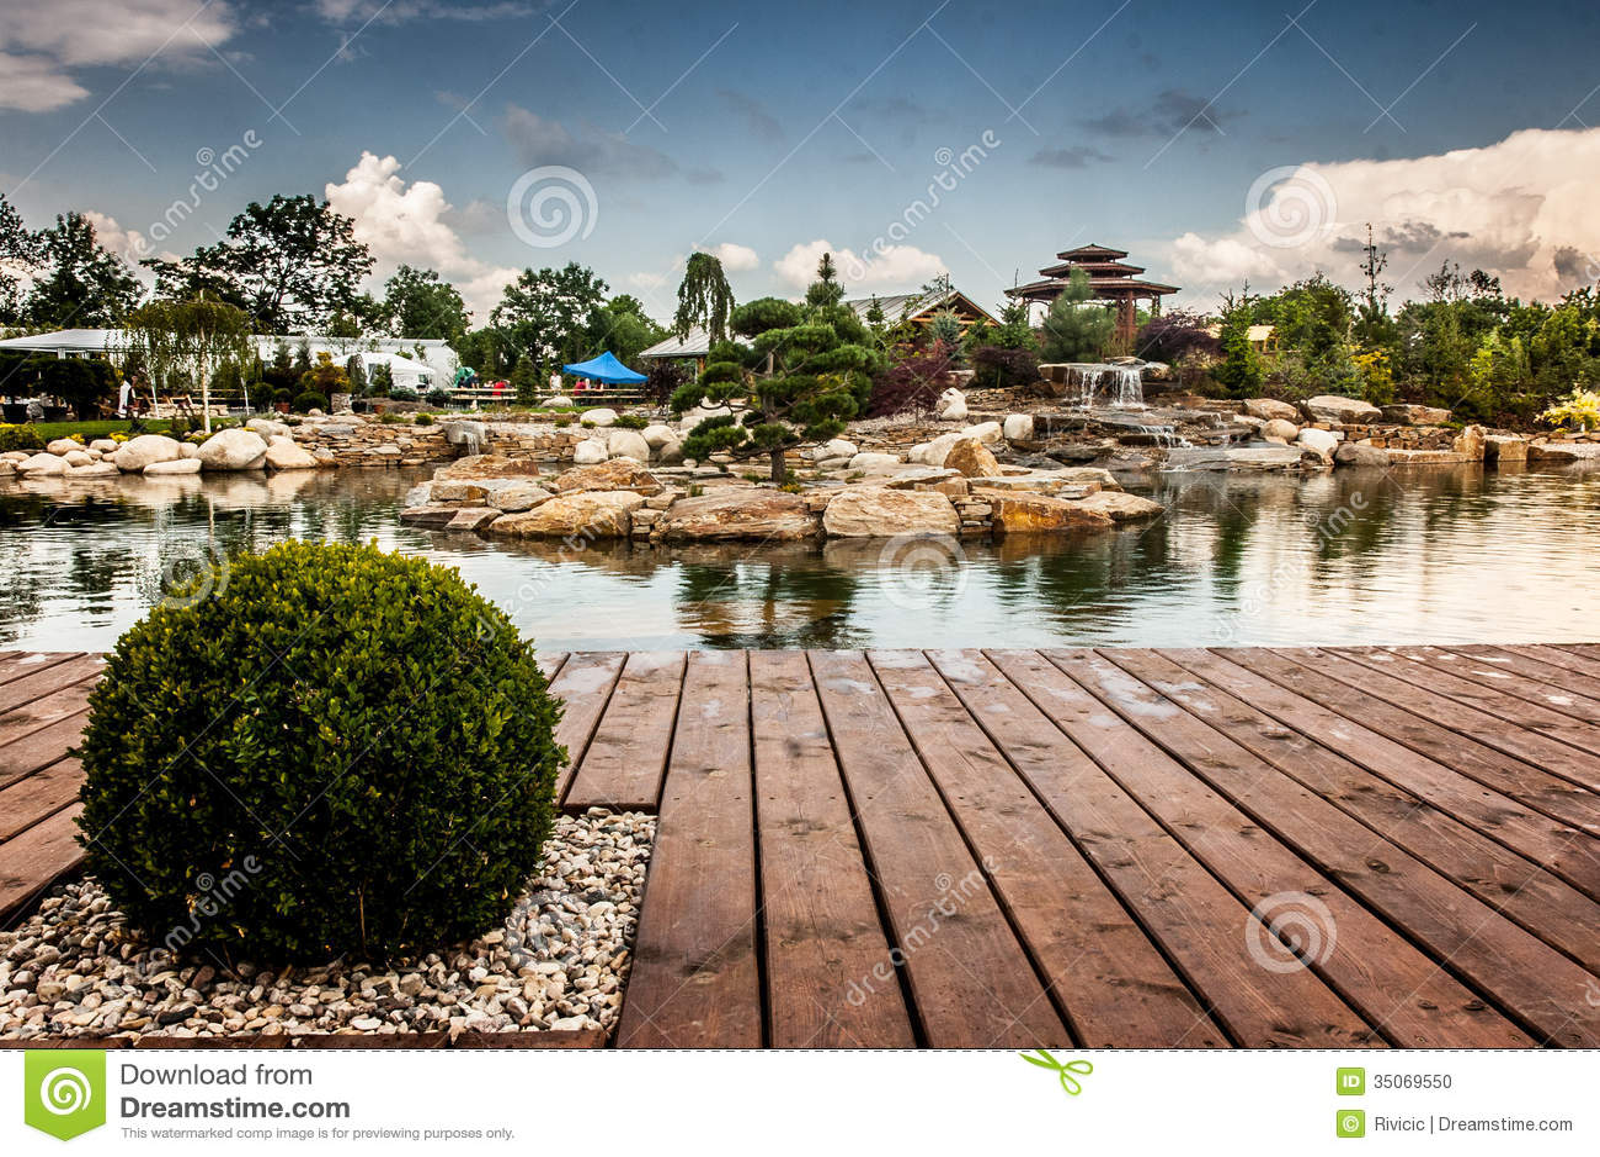 Pond In Garden Center Stock Photo Image 35069550